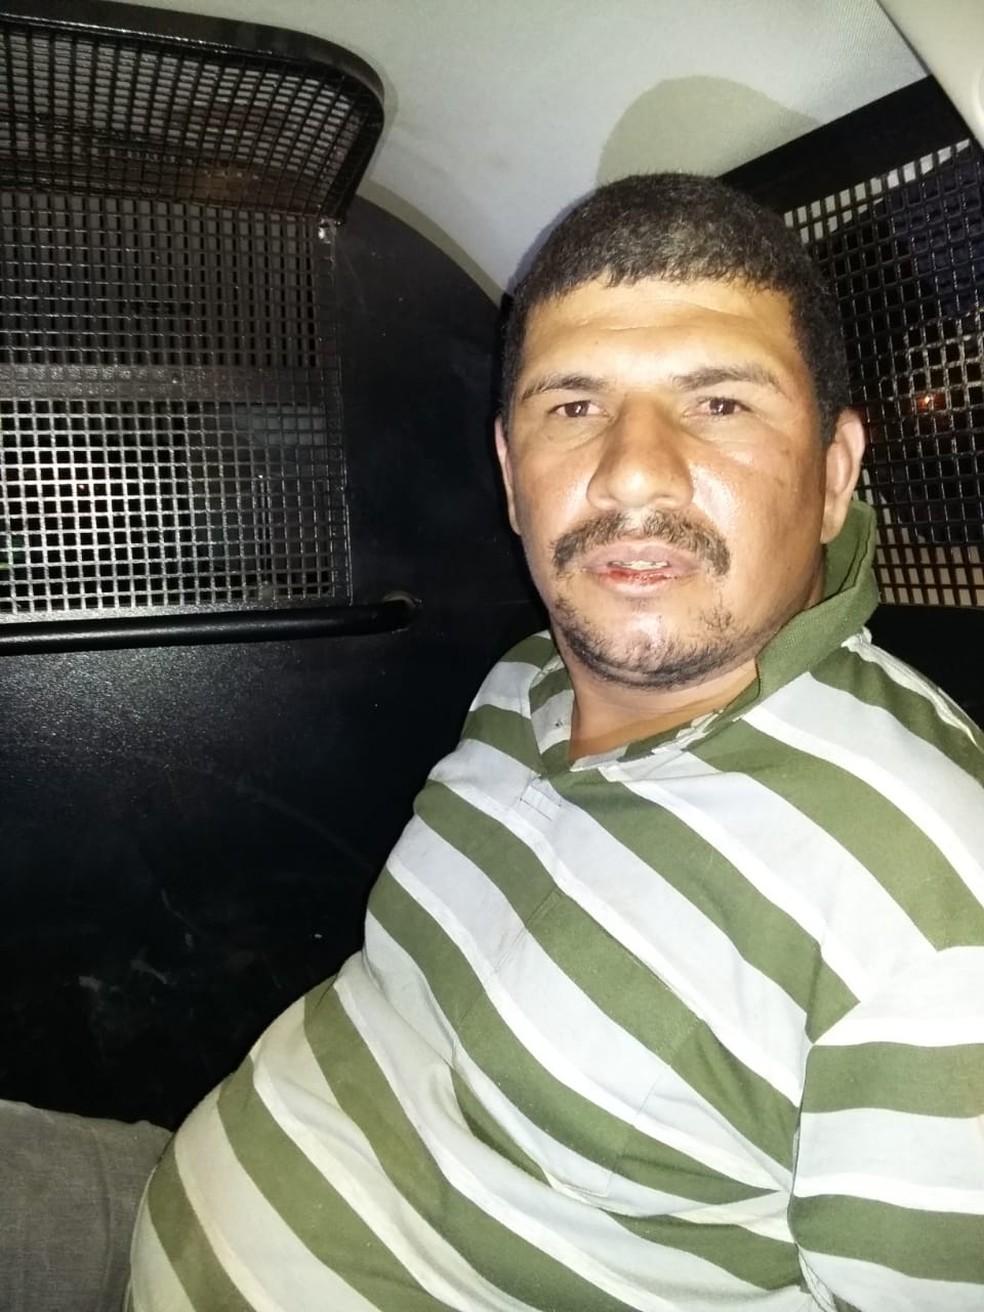 O vigilante, identificado como Luiz Fernando Nunes de Souza, de 31 anos, foi preso em flagrante — Foto: DHPP/Rondonópolis